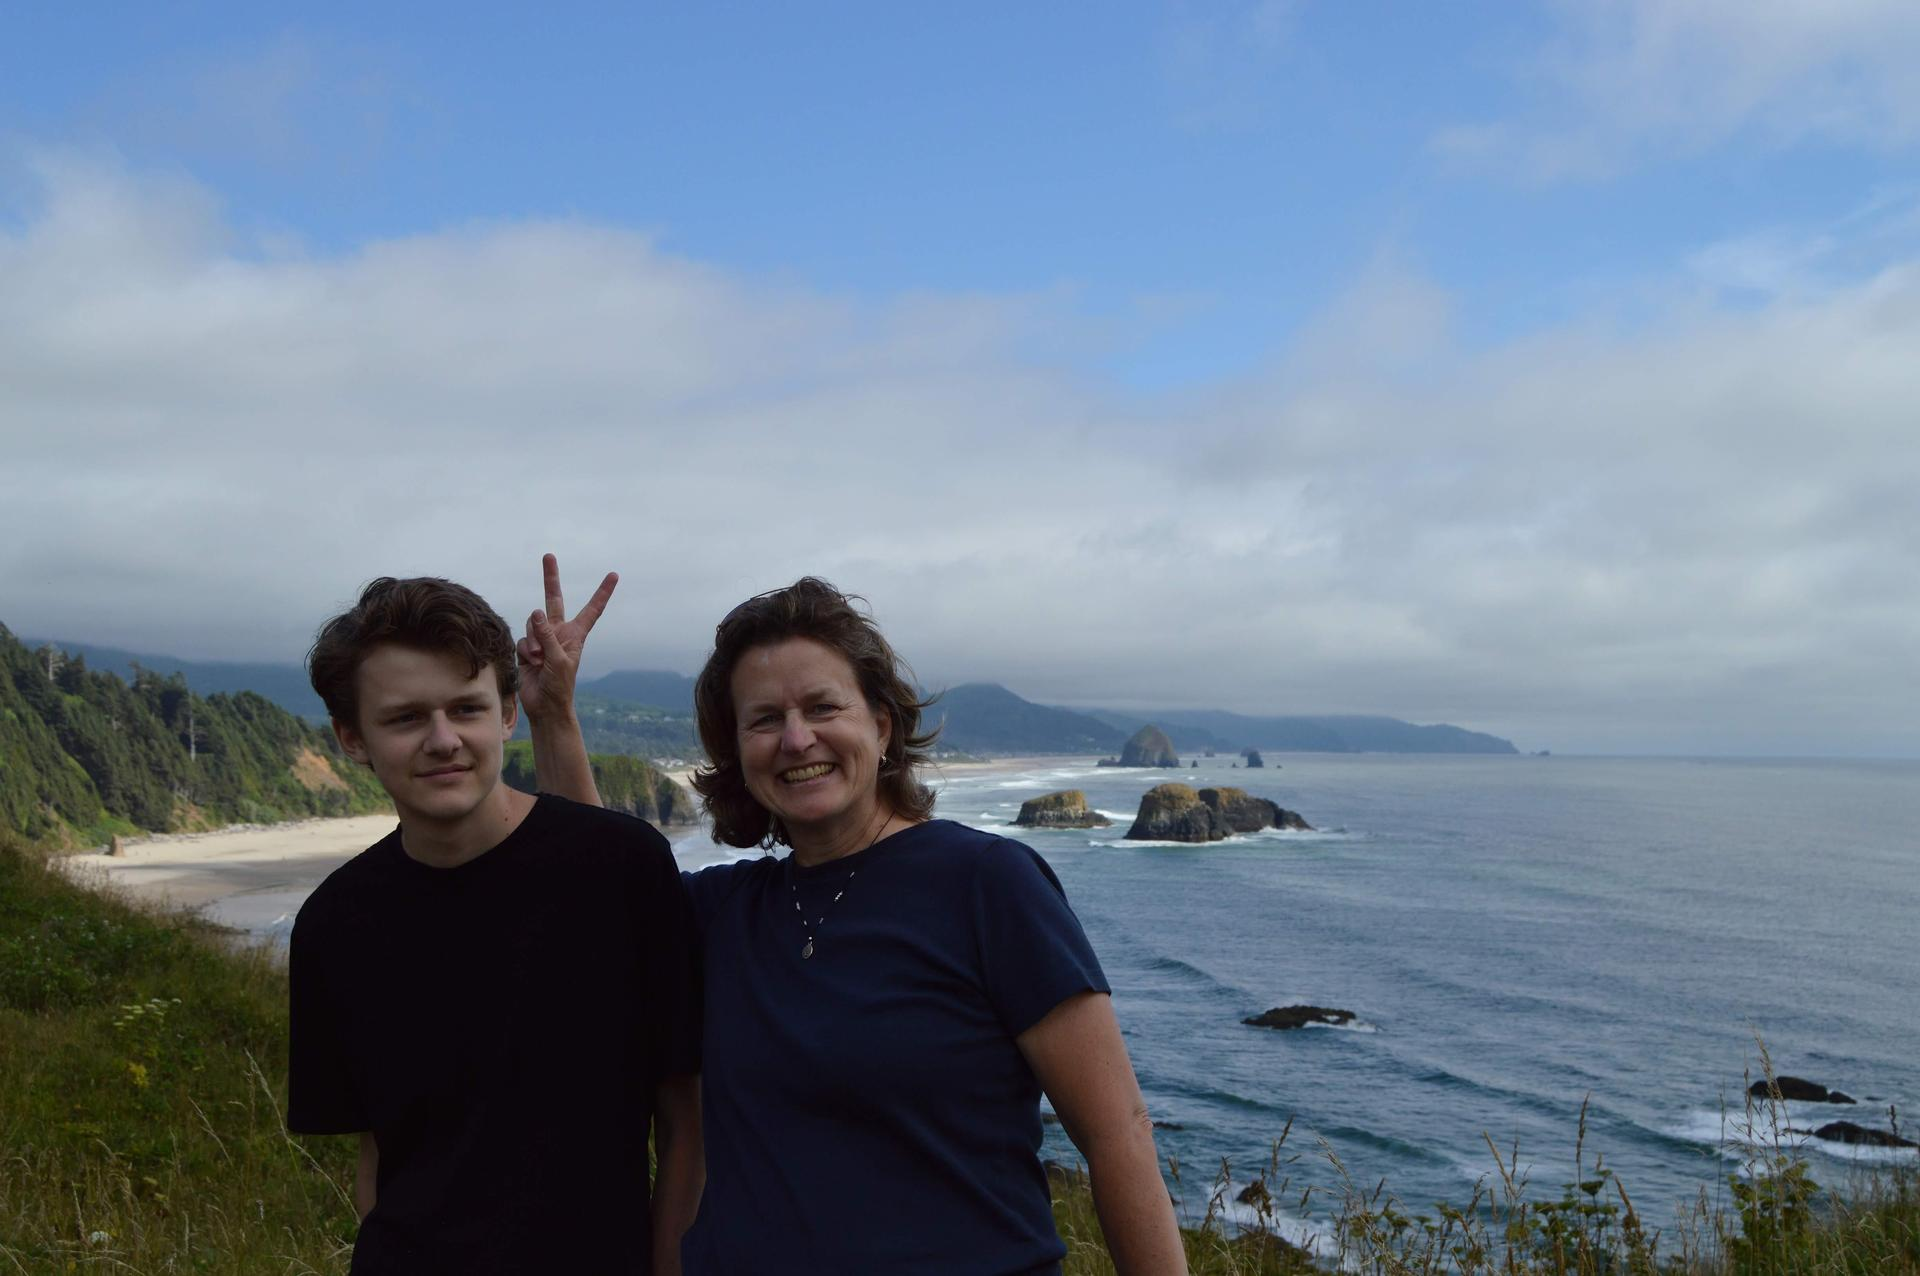 Josh & I at Cannon Beach, OR